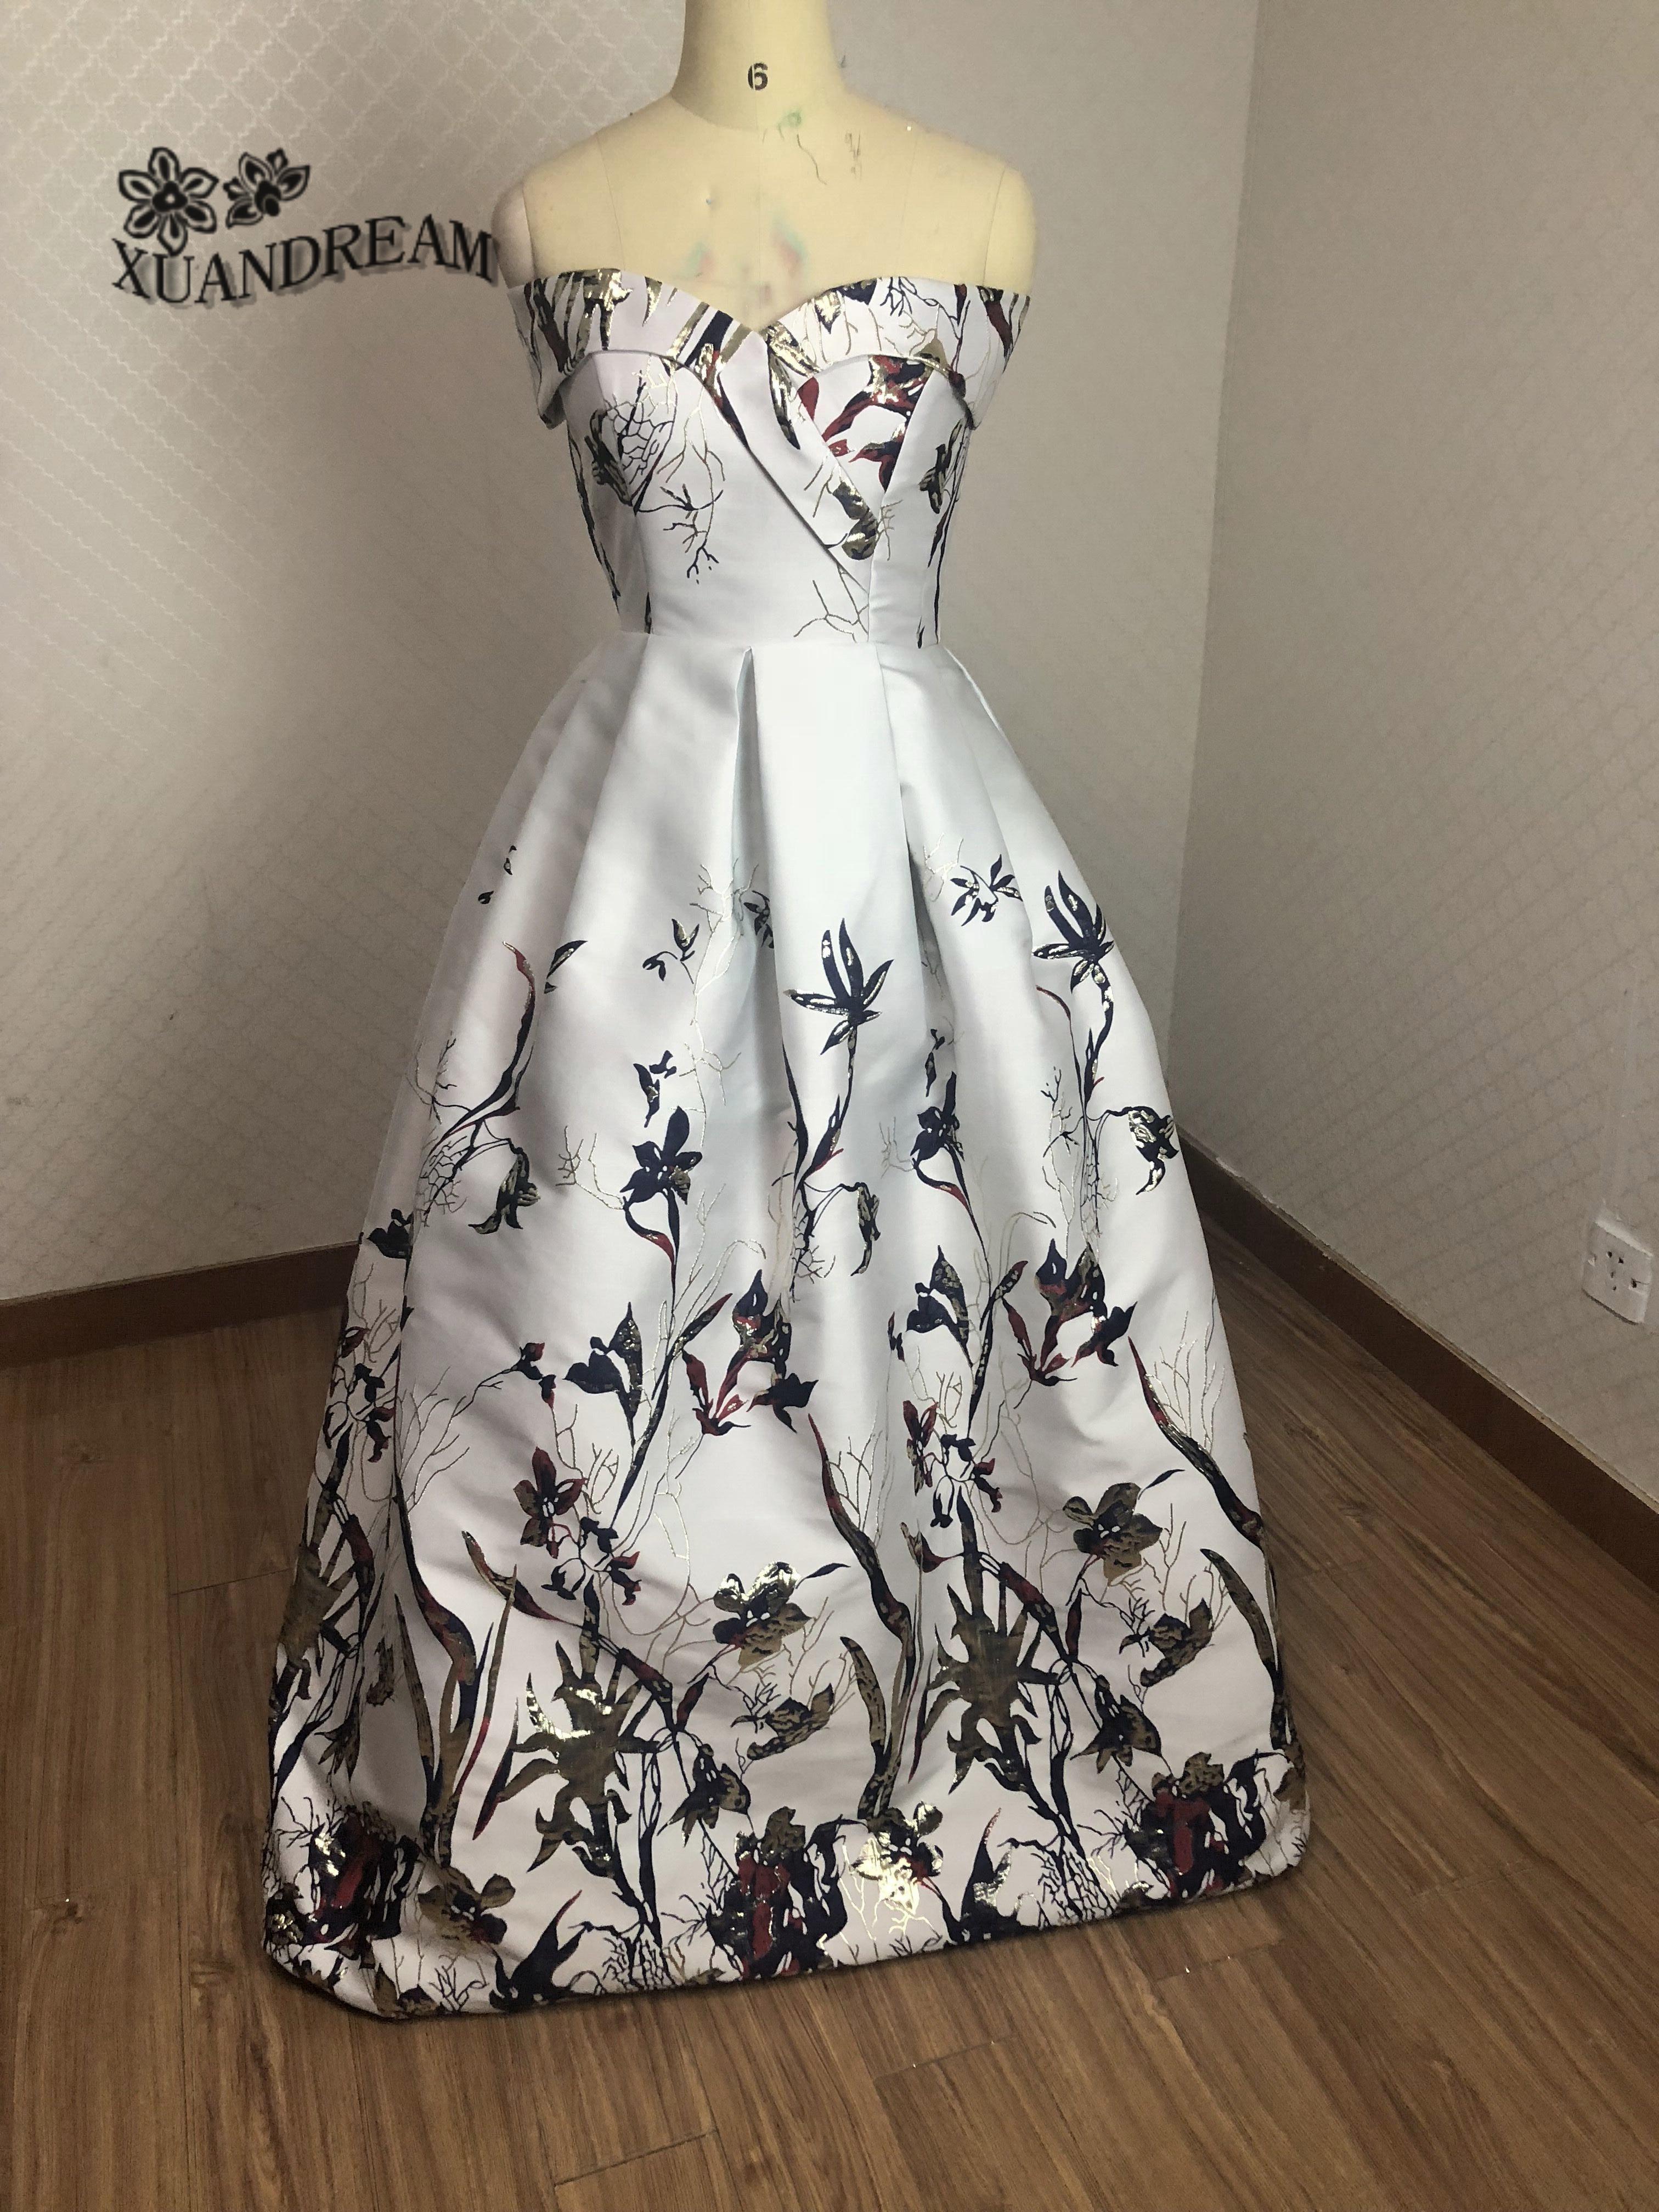 2019 Specail Occasion Print Robe De Soiree Courte Vestidos Ever Pretty Vestido De Gala Longo Former Long Prom Dresses Xd 64 Prom Dresses Aliexpress